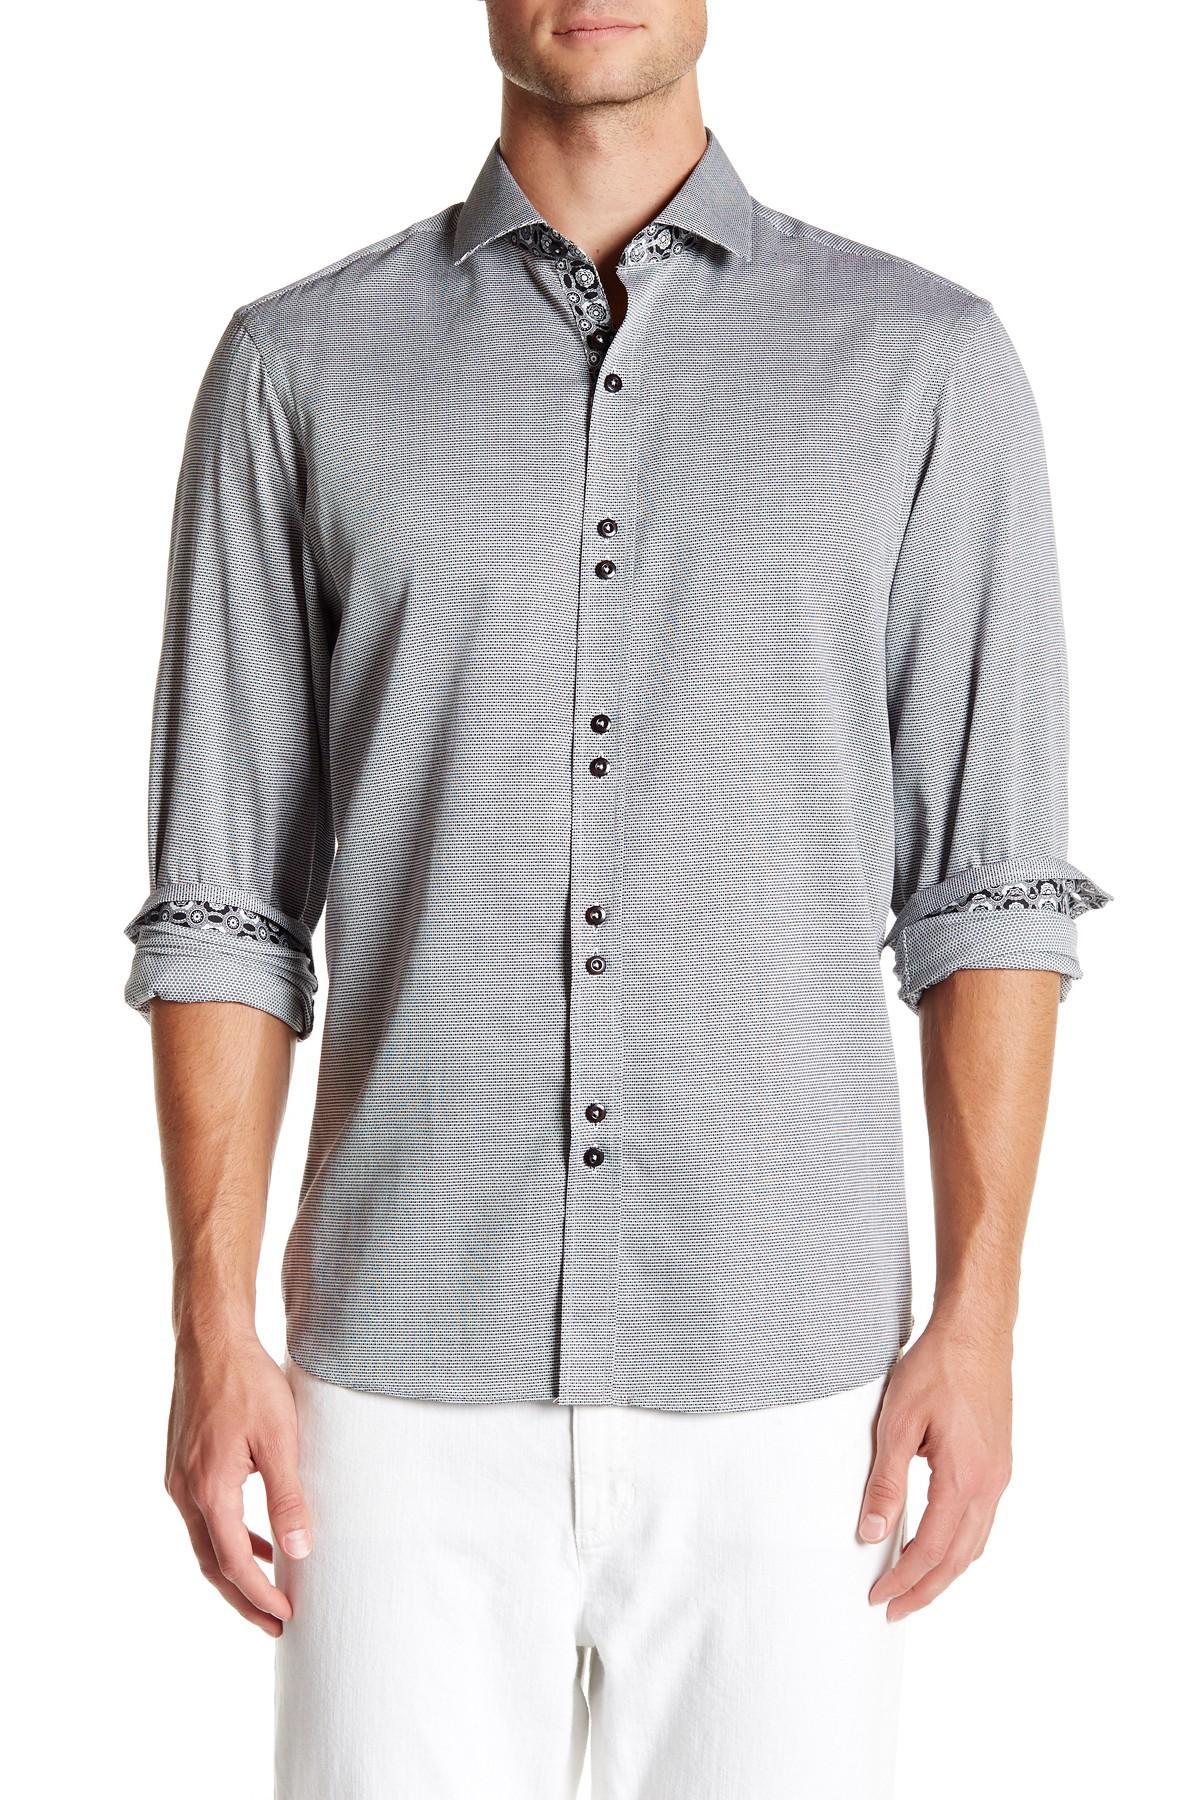 Coogi oxford regular fit dress shirt for men lyst for Regular fit dress shirt